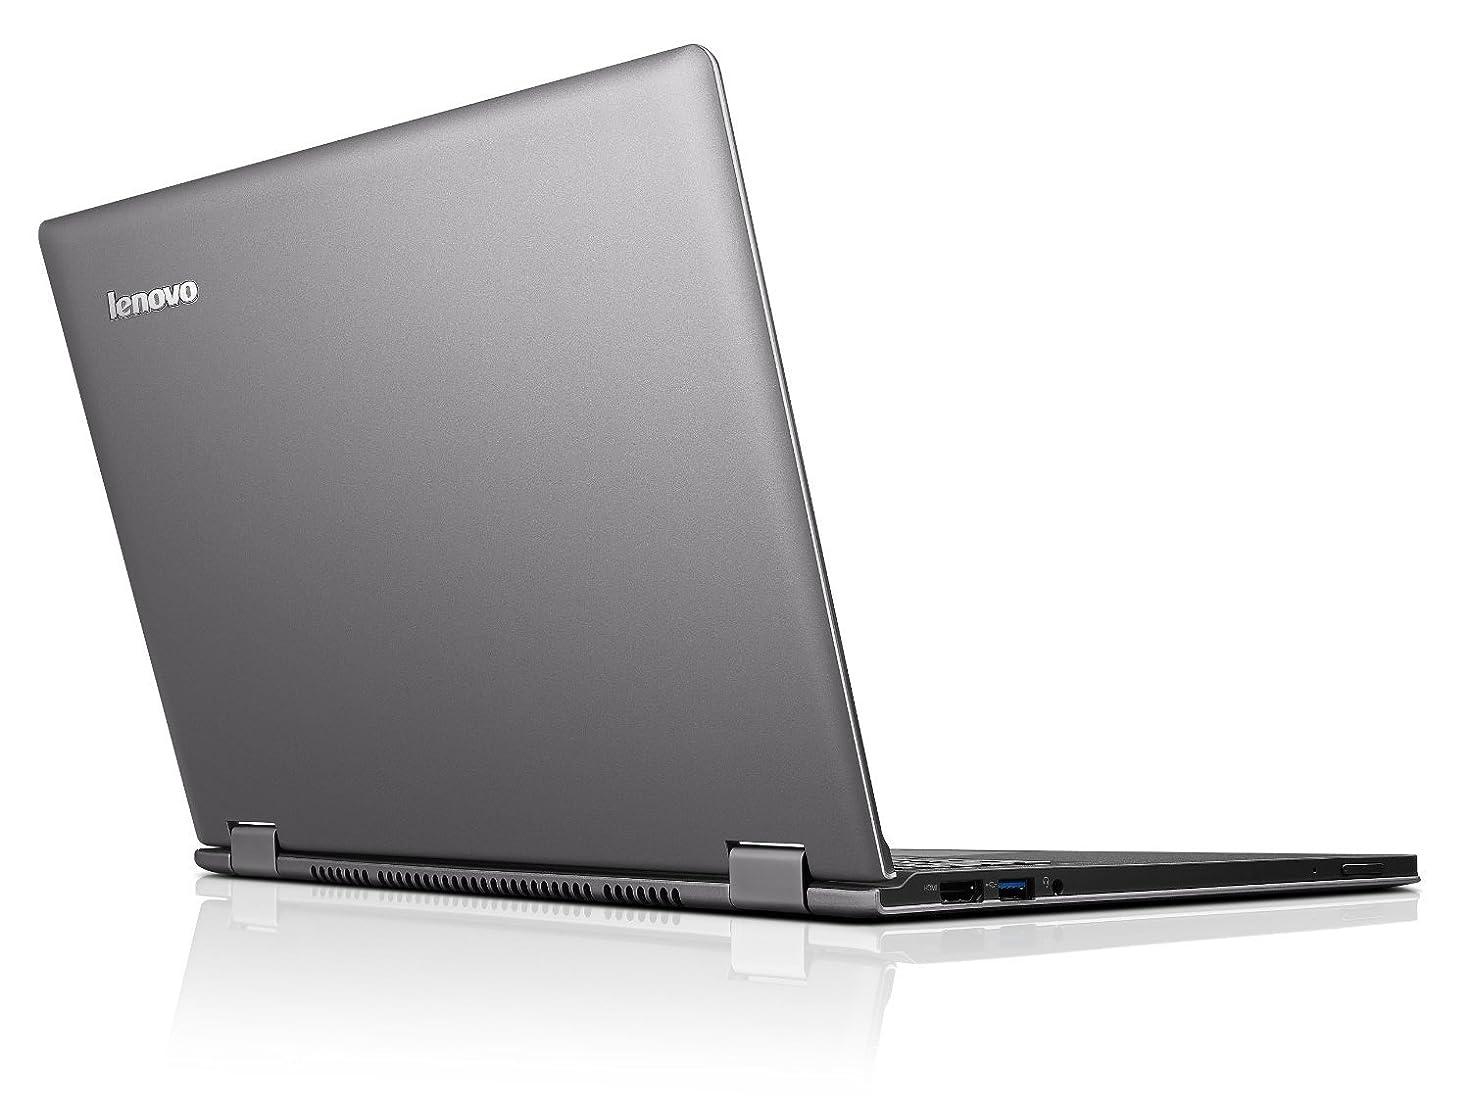 Lenovo Yoga 2 Pro Convertible Ultrabook - 59428032 - Core i7-4510U, 256GB SSD, 8GB RAM, 13.3